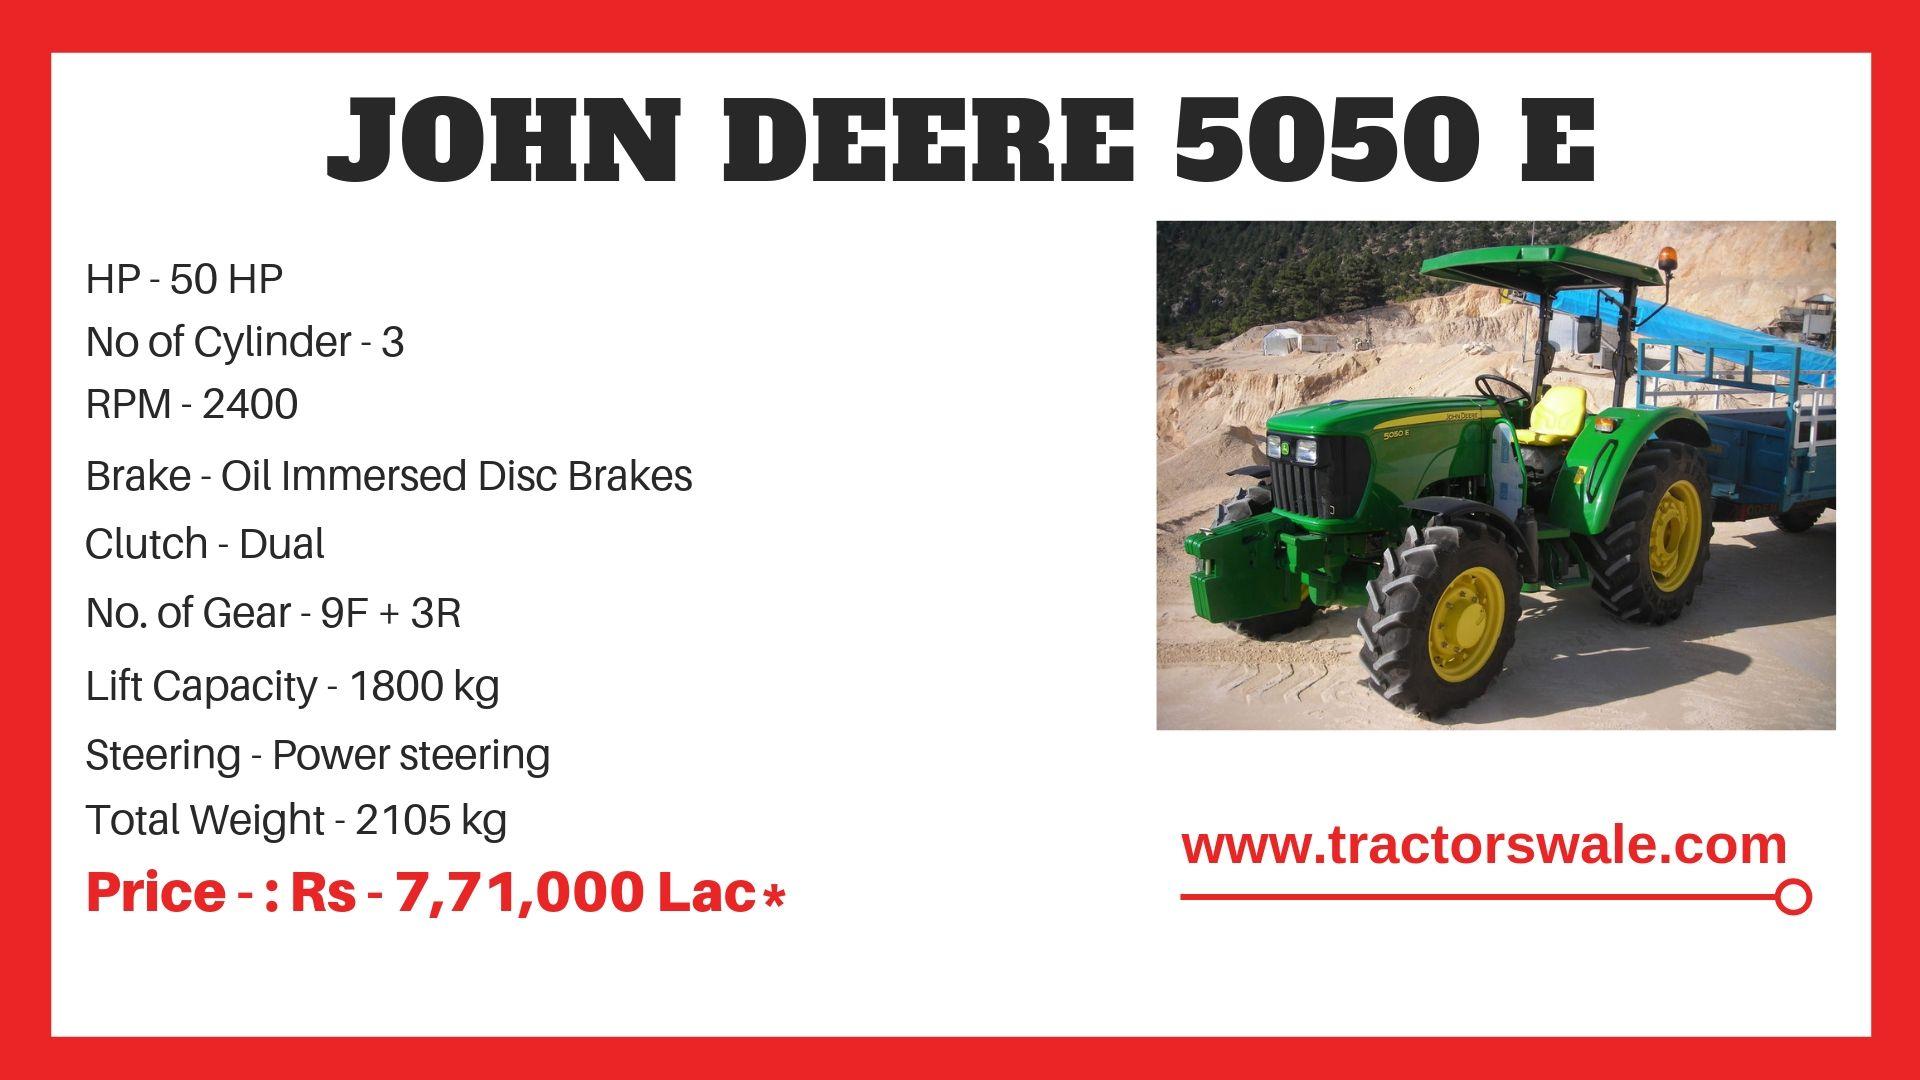 John Deere 5050 E Tractor Specifications